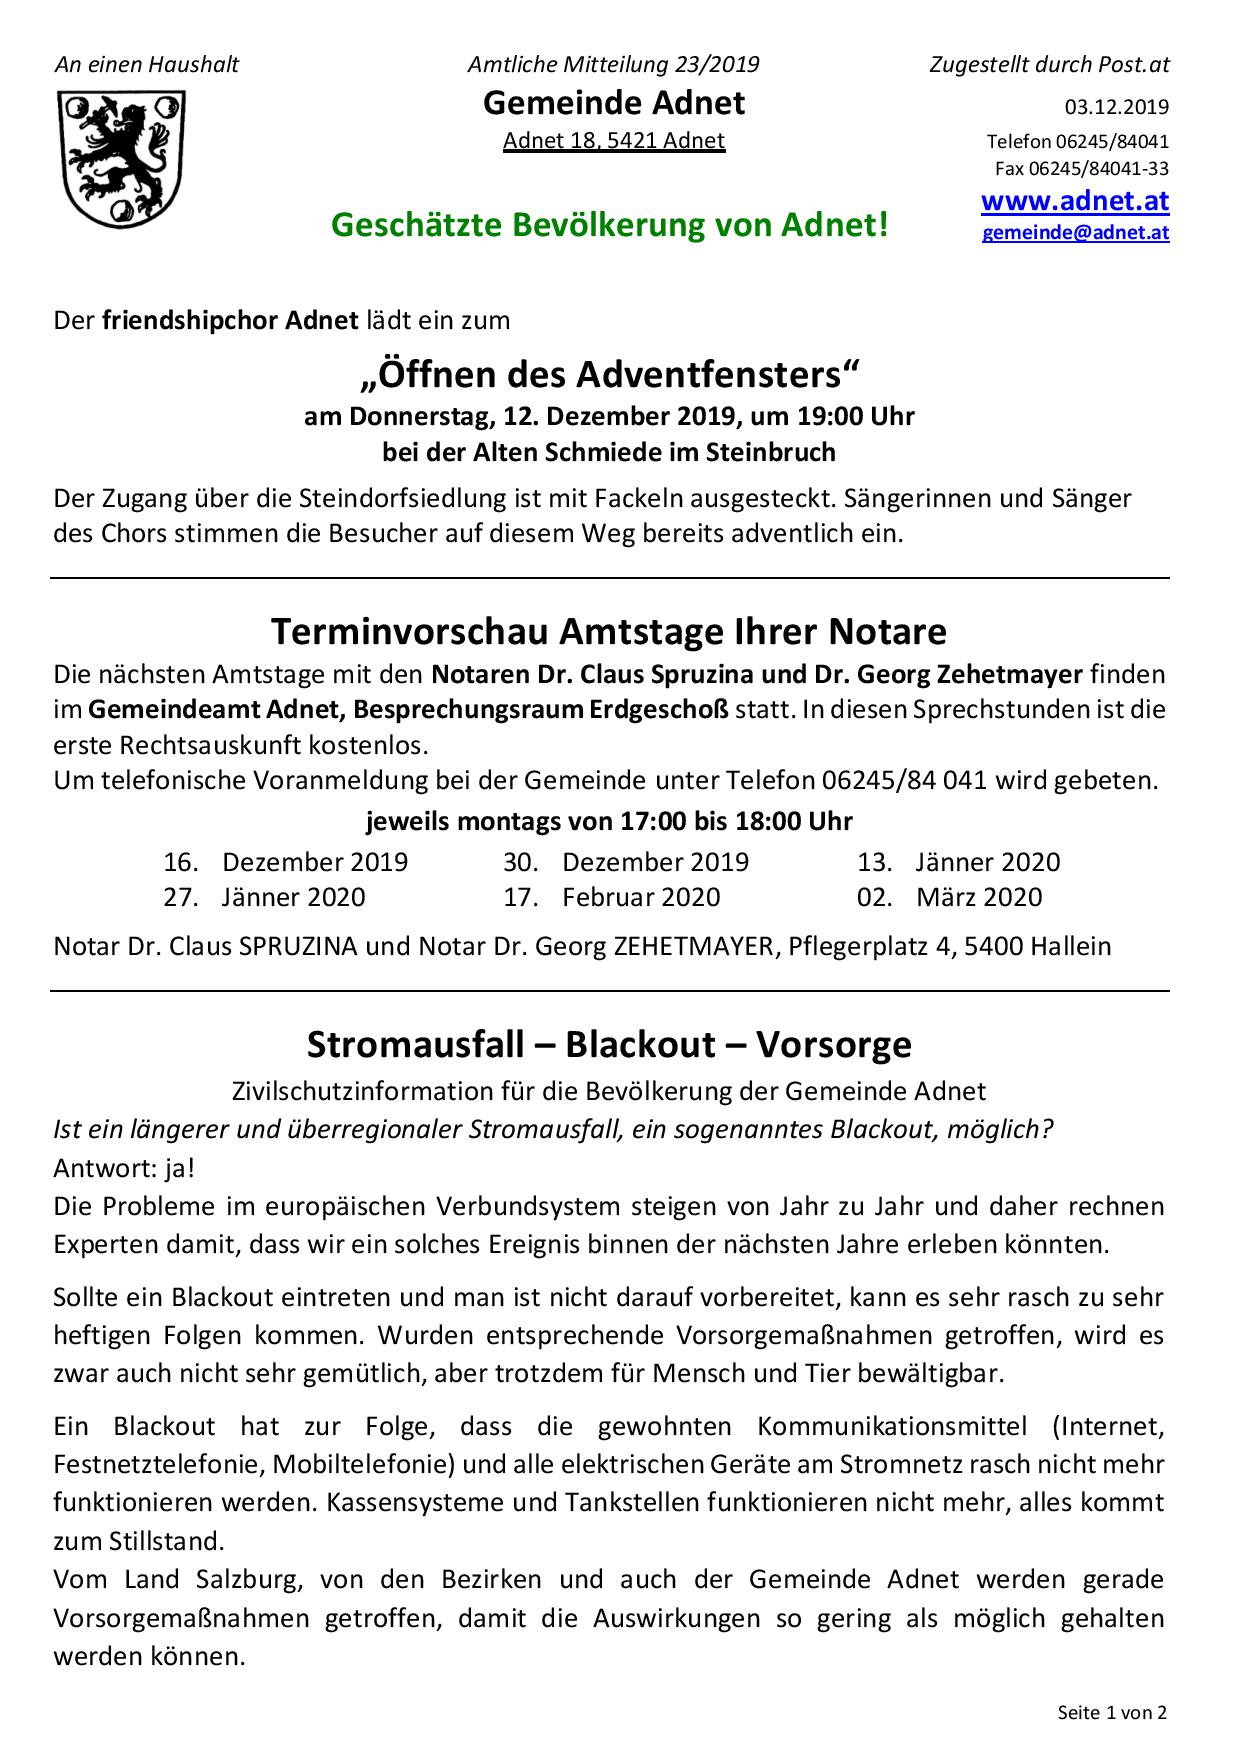 carolinavolksfolks.com - Brgerservice - Jobs - Gemeinde Adnet